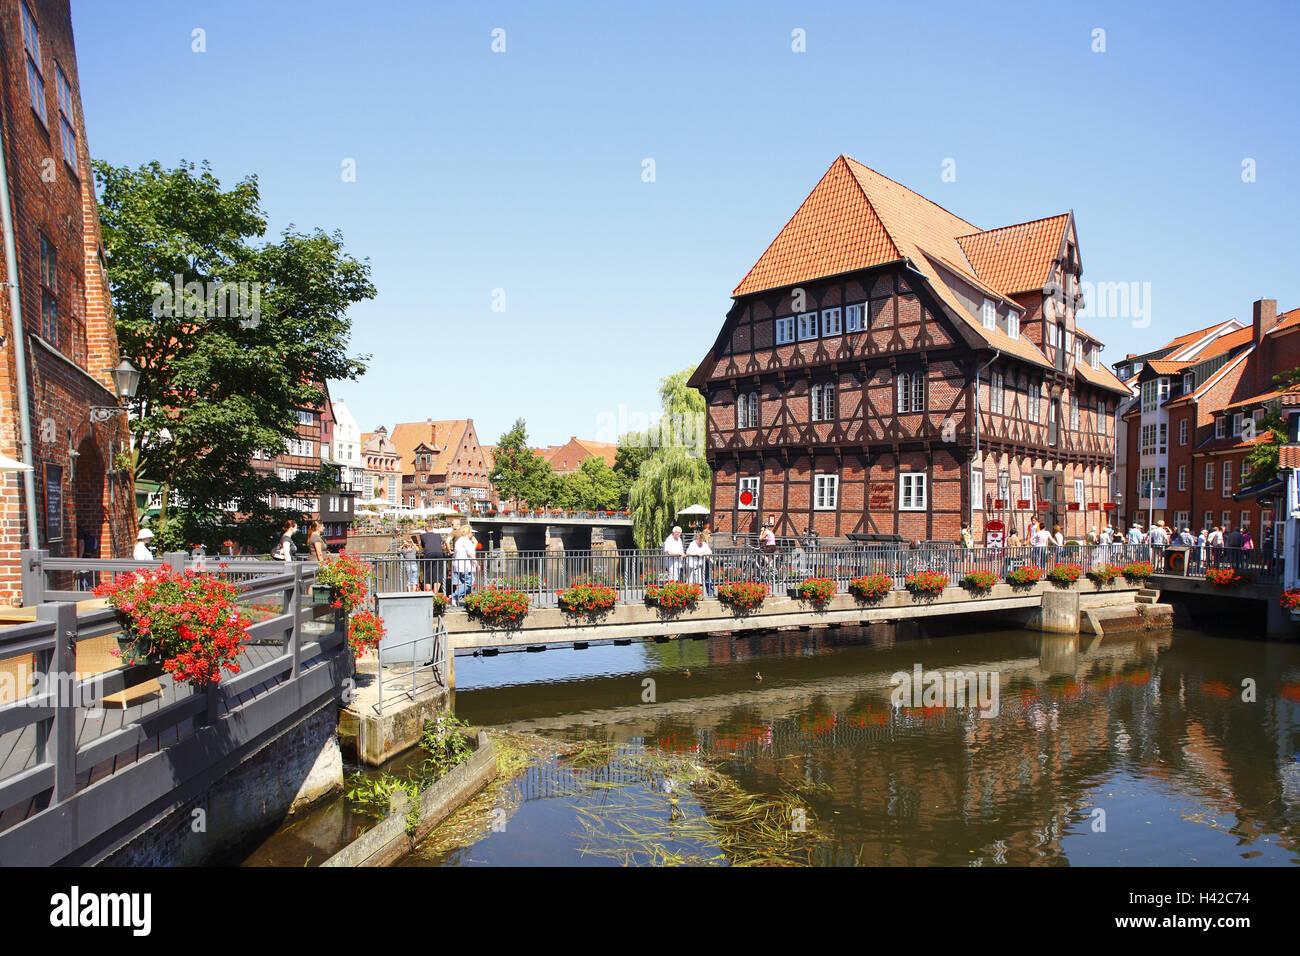 Lüneburg Stadt Fachwerkhaus Hotel Bergstroem in Ilmenau